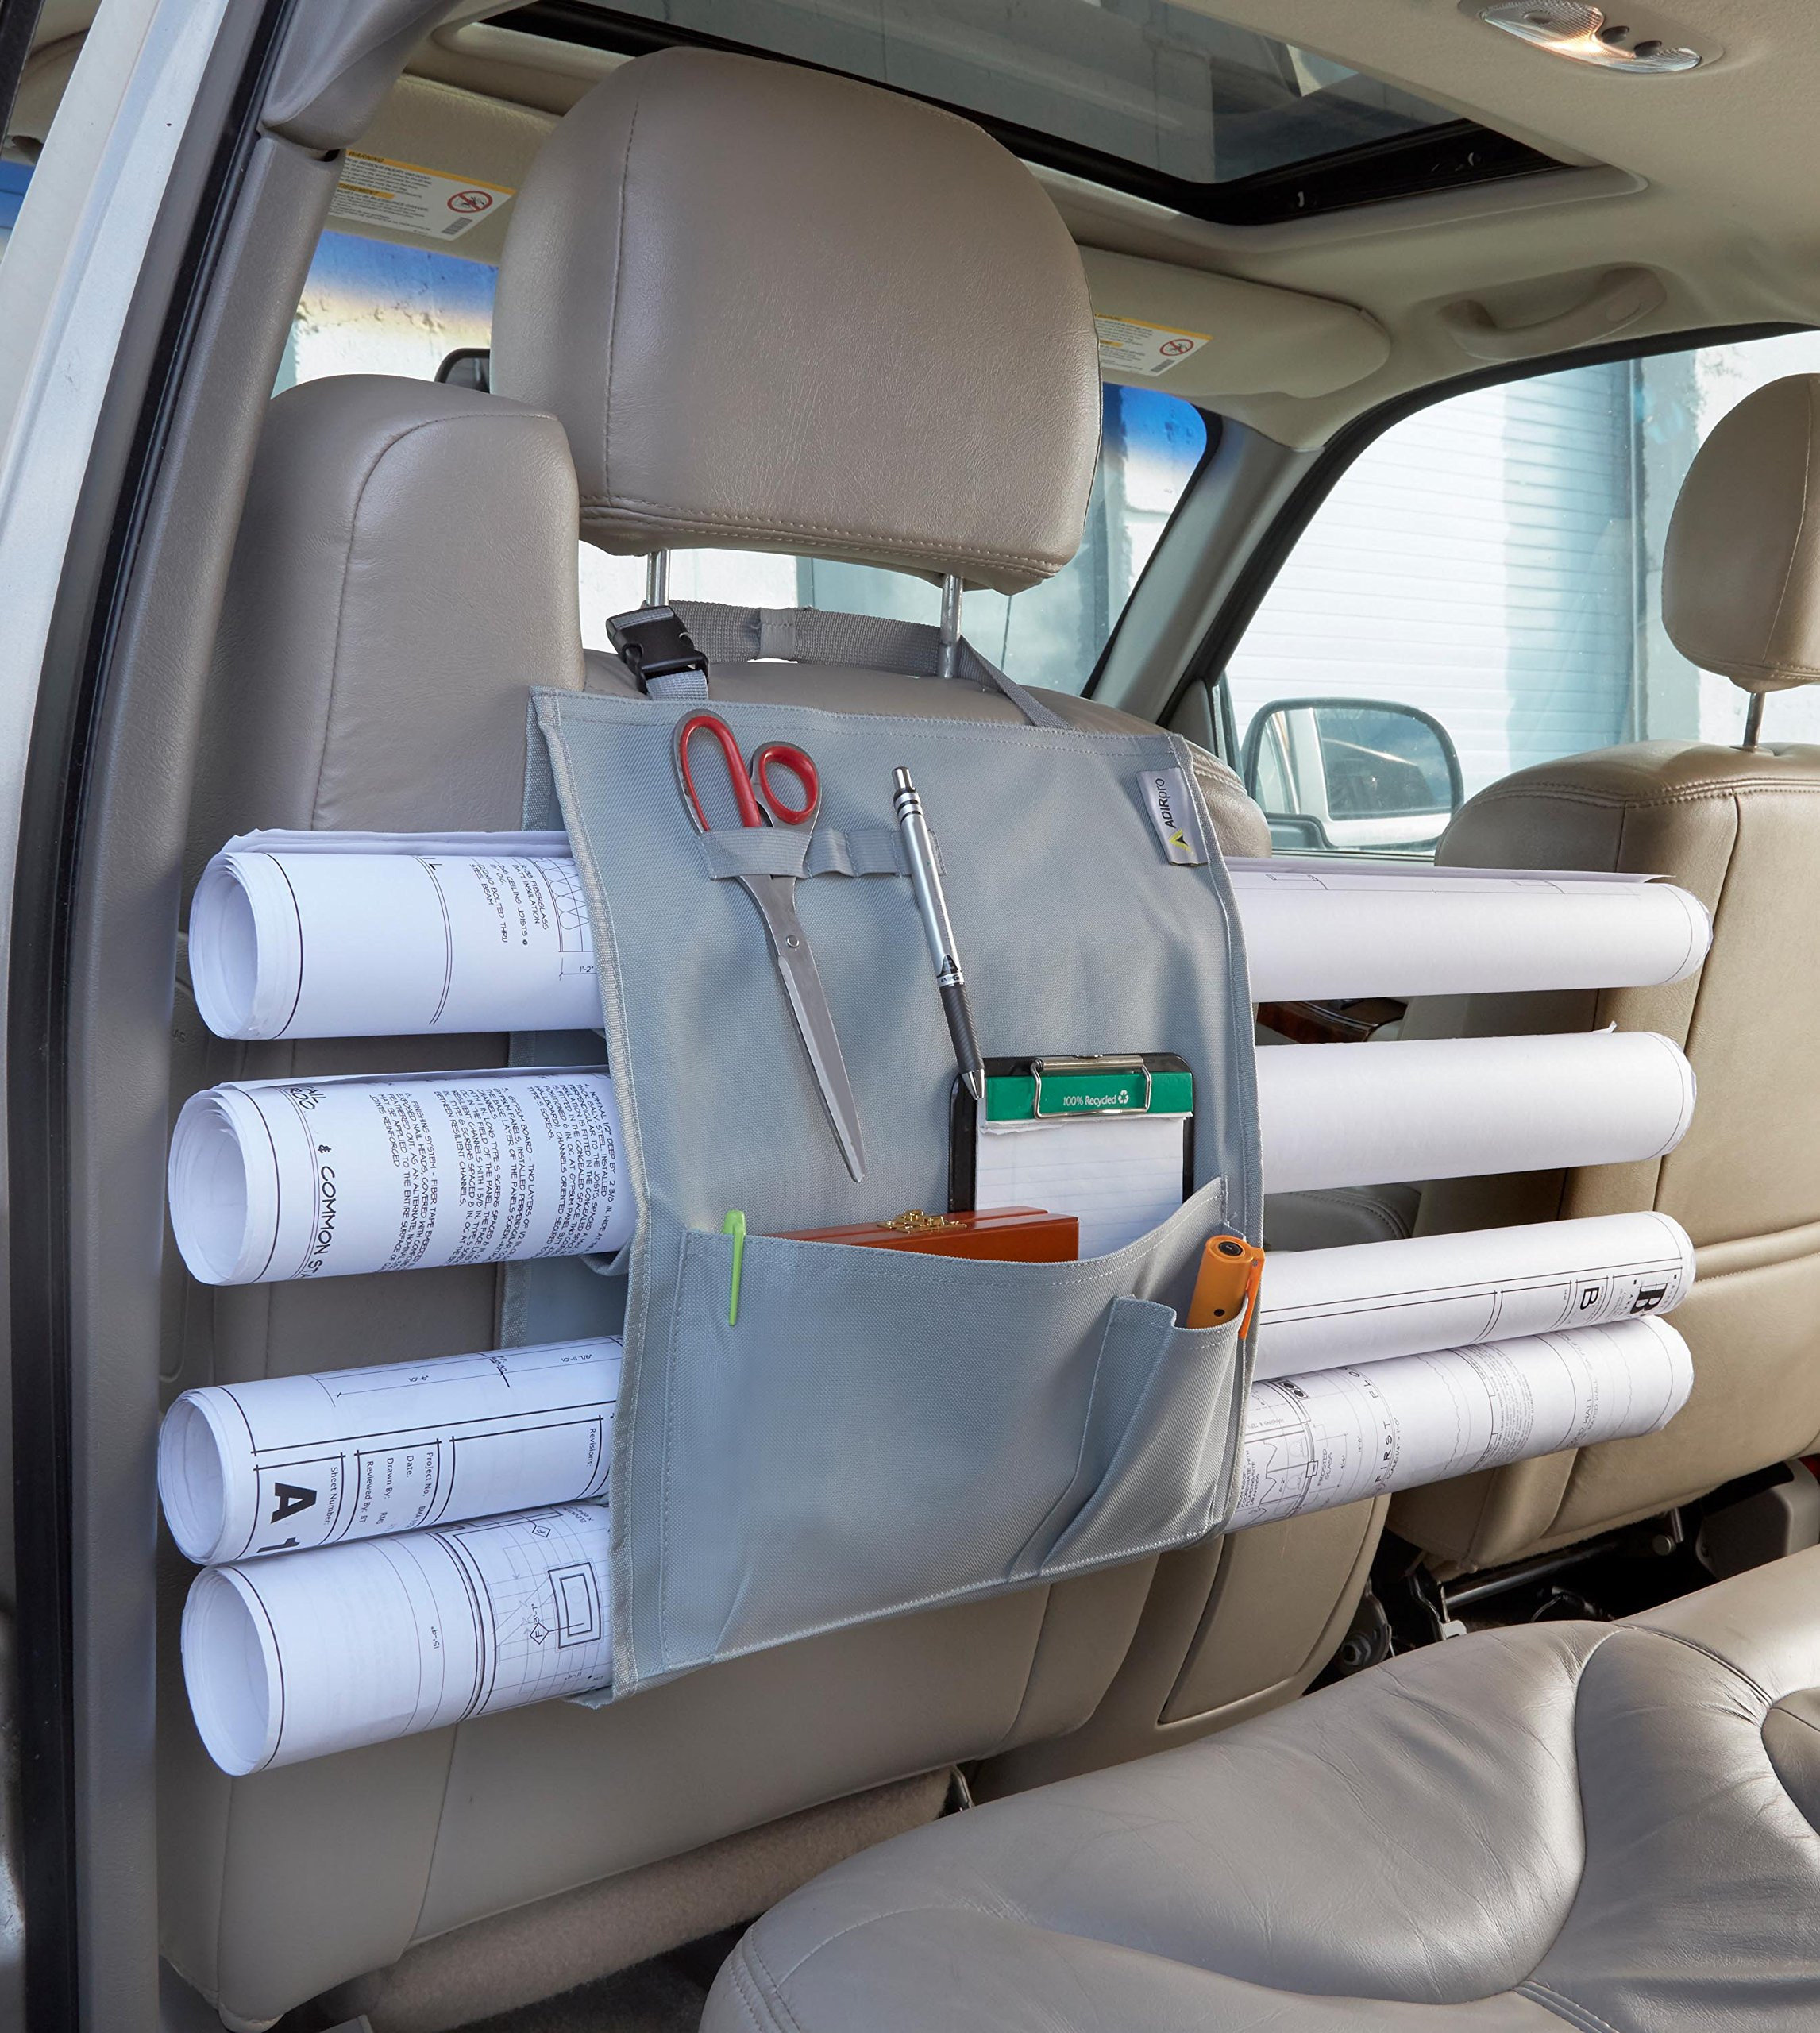 Adir Plans Car Holder, Blueprints Car Holder, Maps Car Holder, Darwings Car Holder, Artwork Car Holder, Posters Car Holder, Document Car Holder - with Pockets